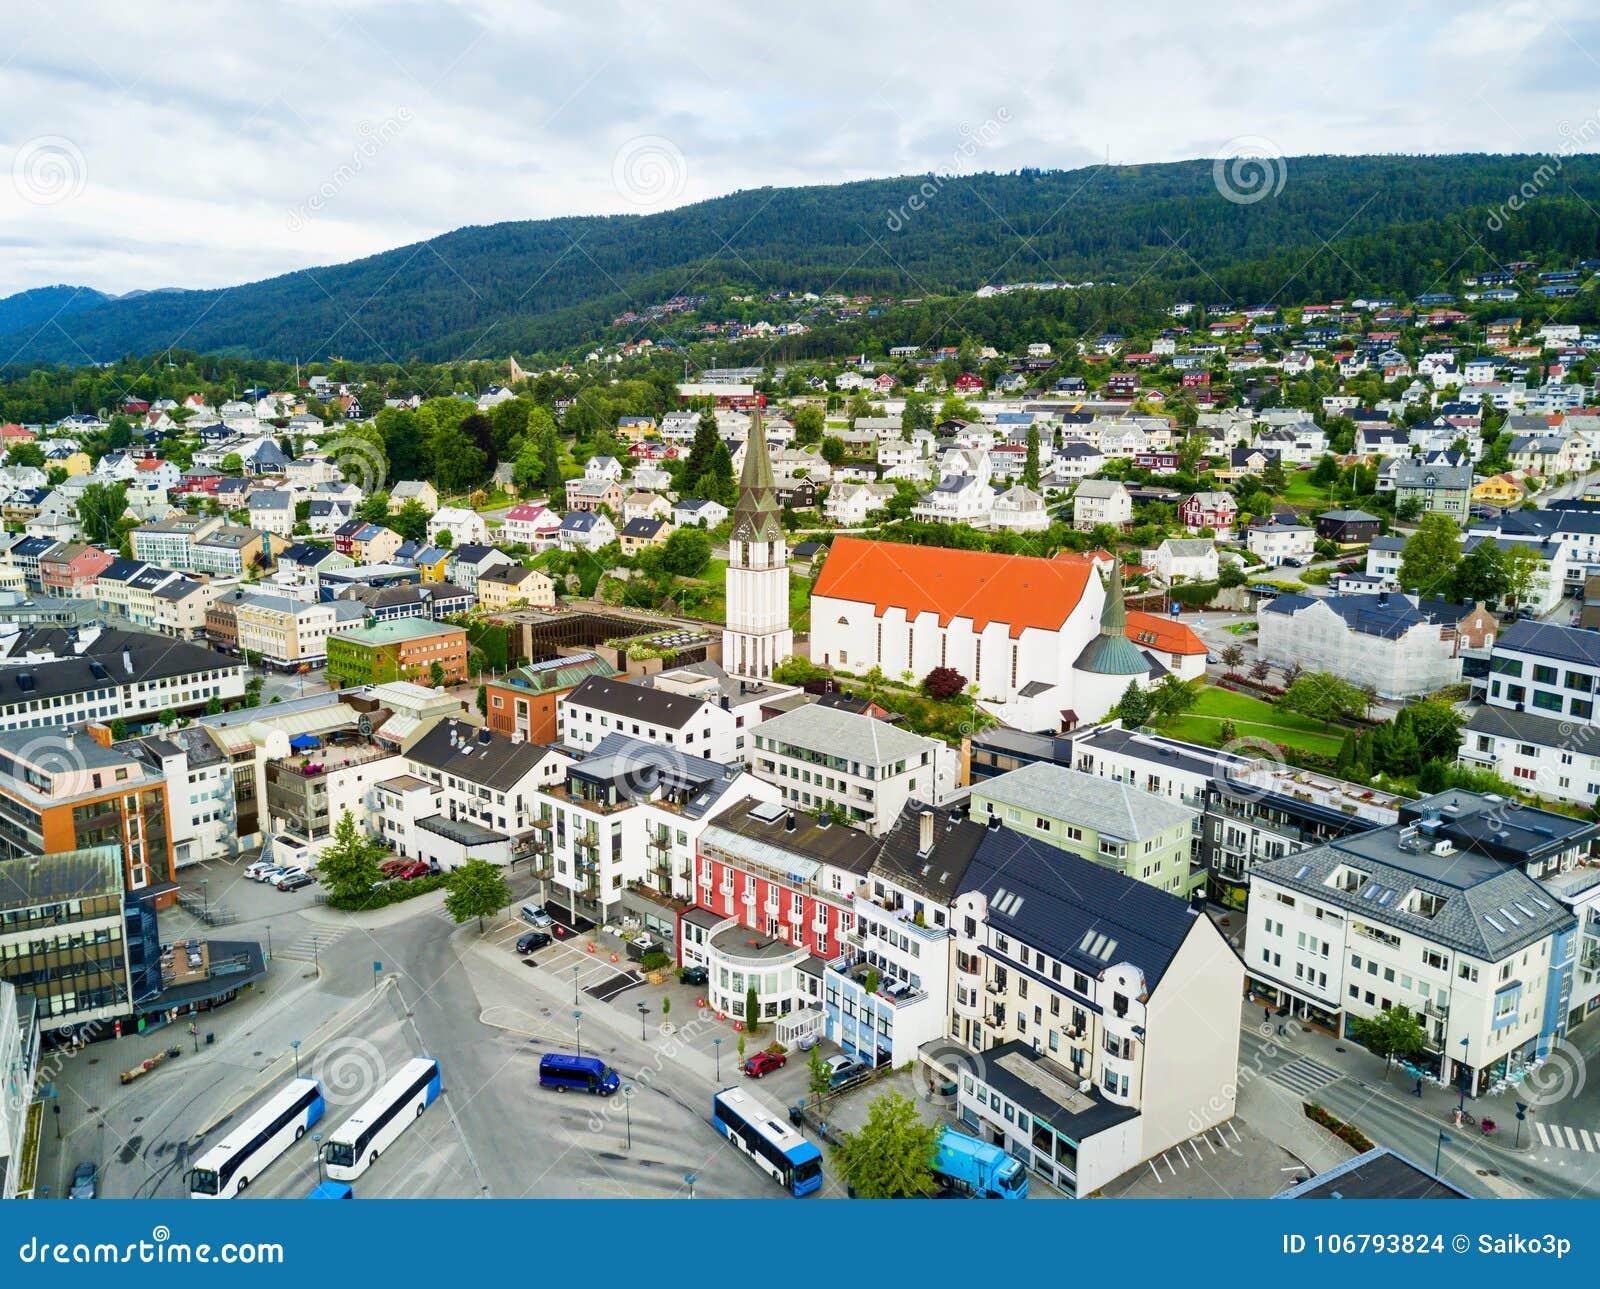 molde city in norway stock photo image of scandinavia 106793824